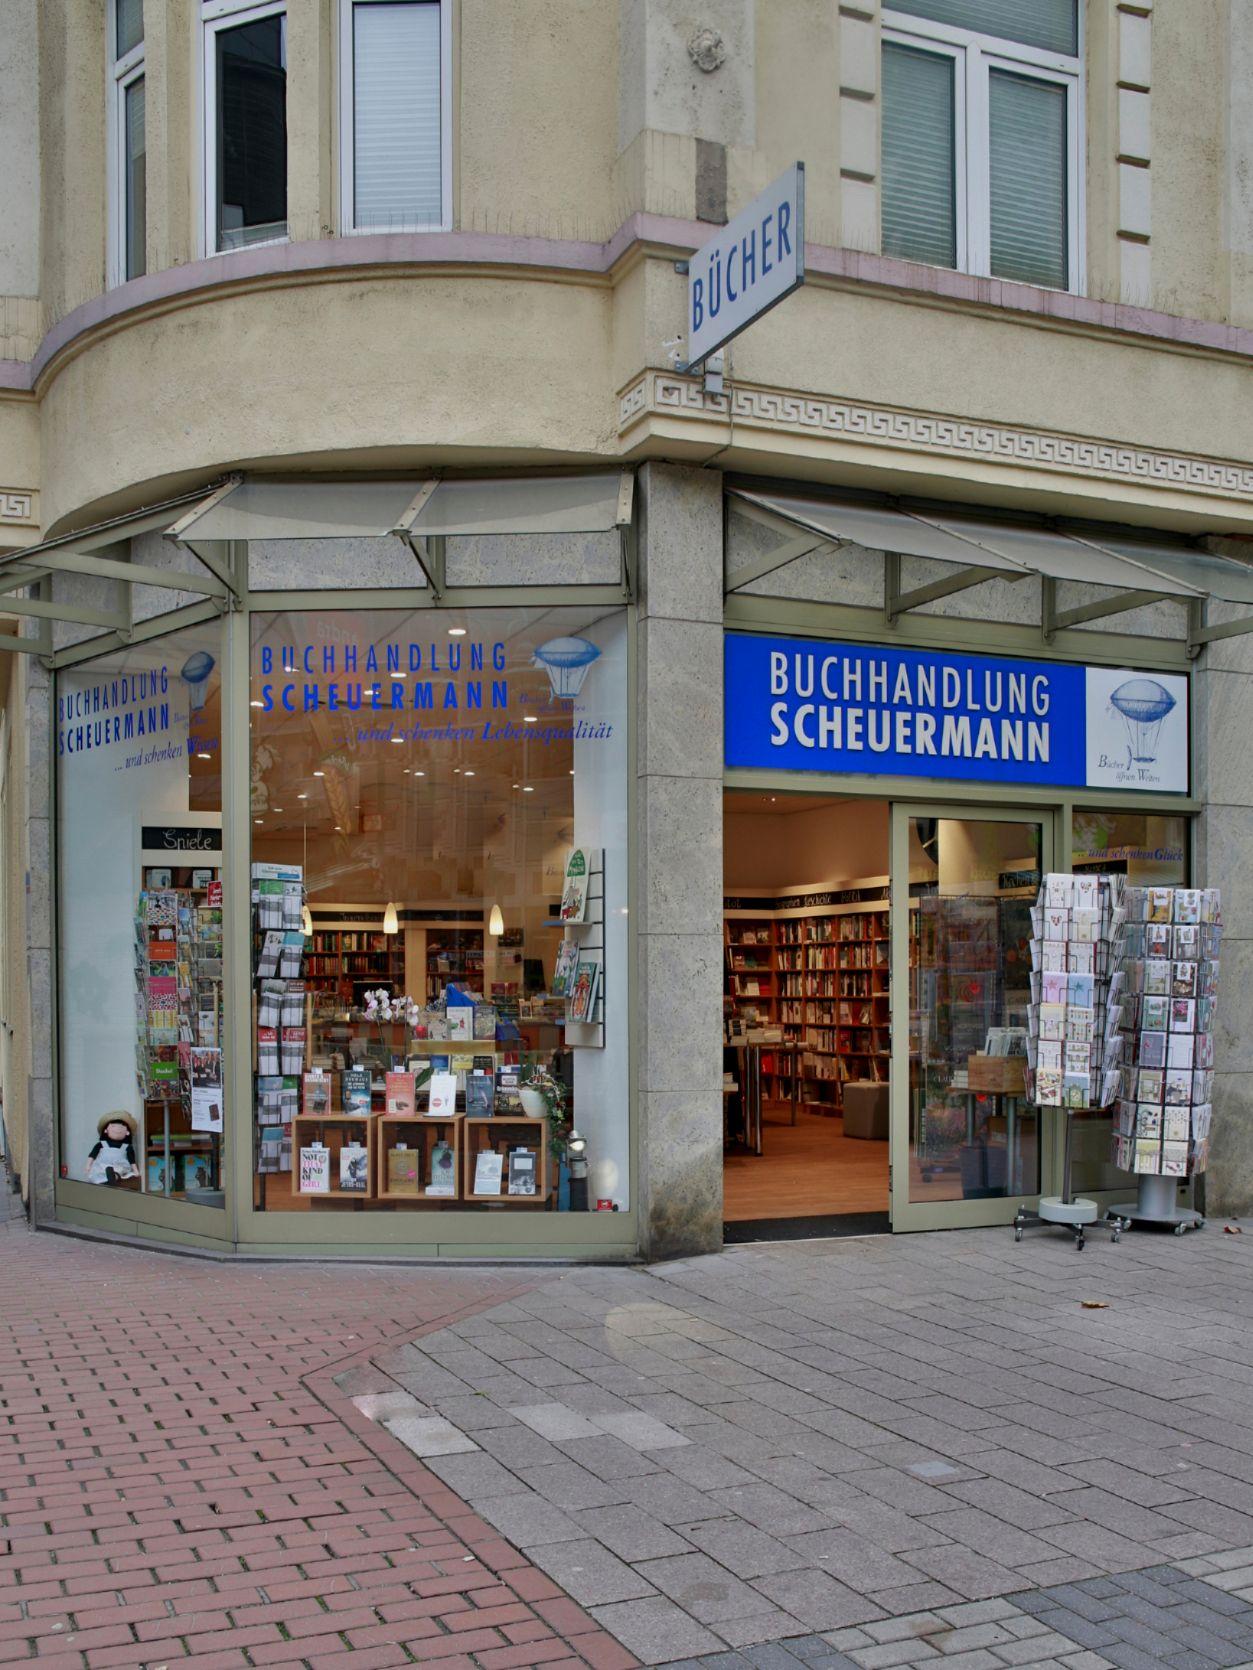 Buchhandlung Scheuermann